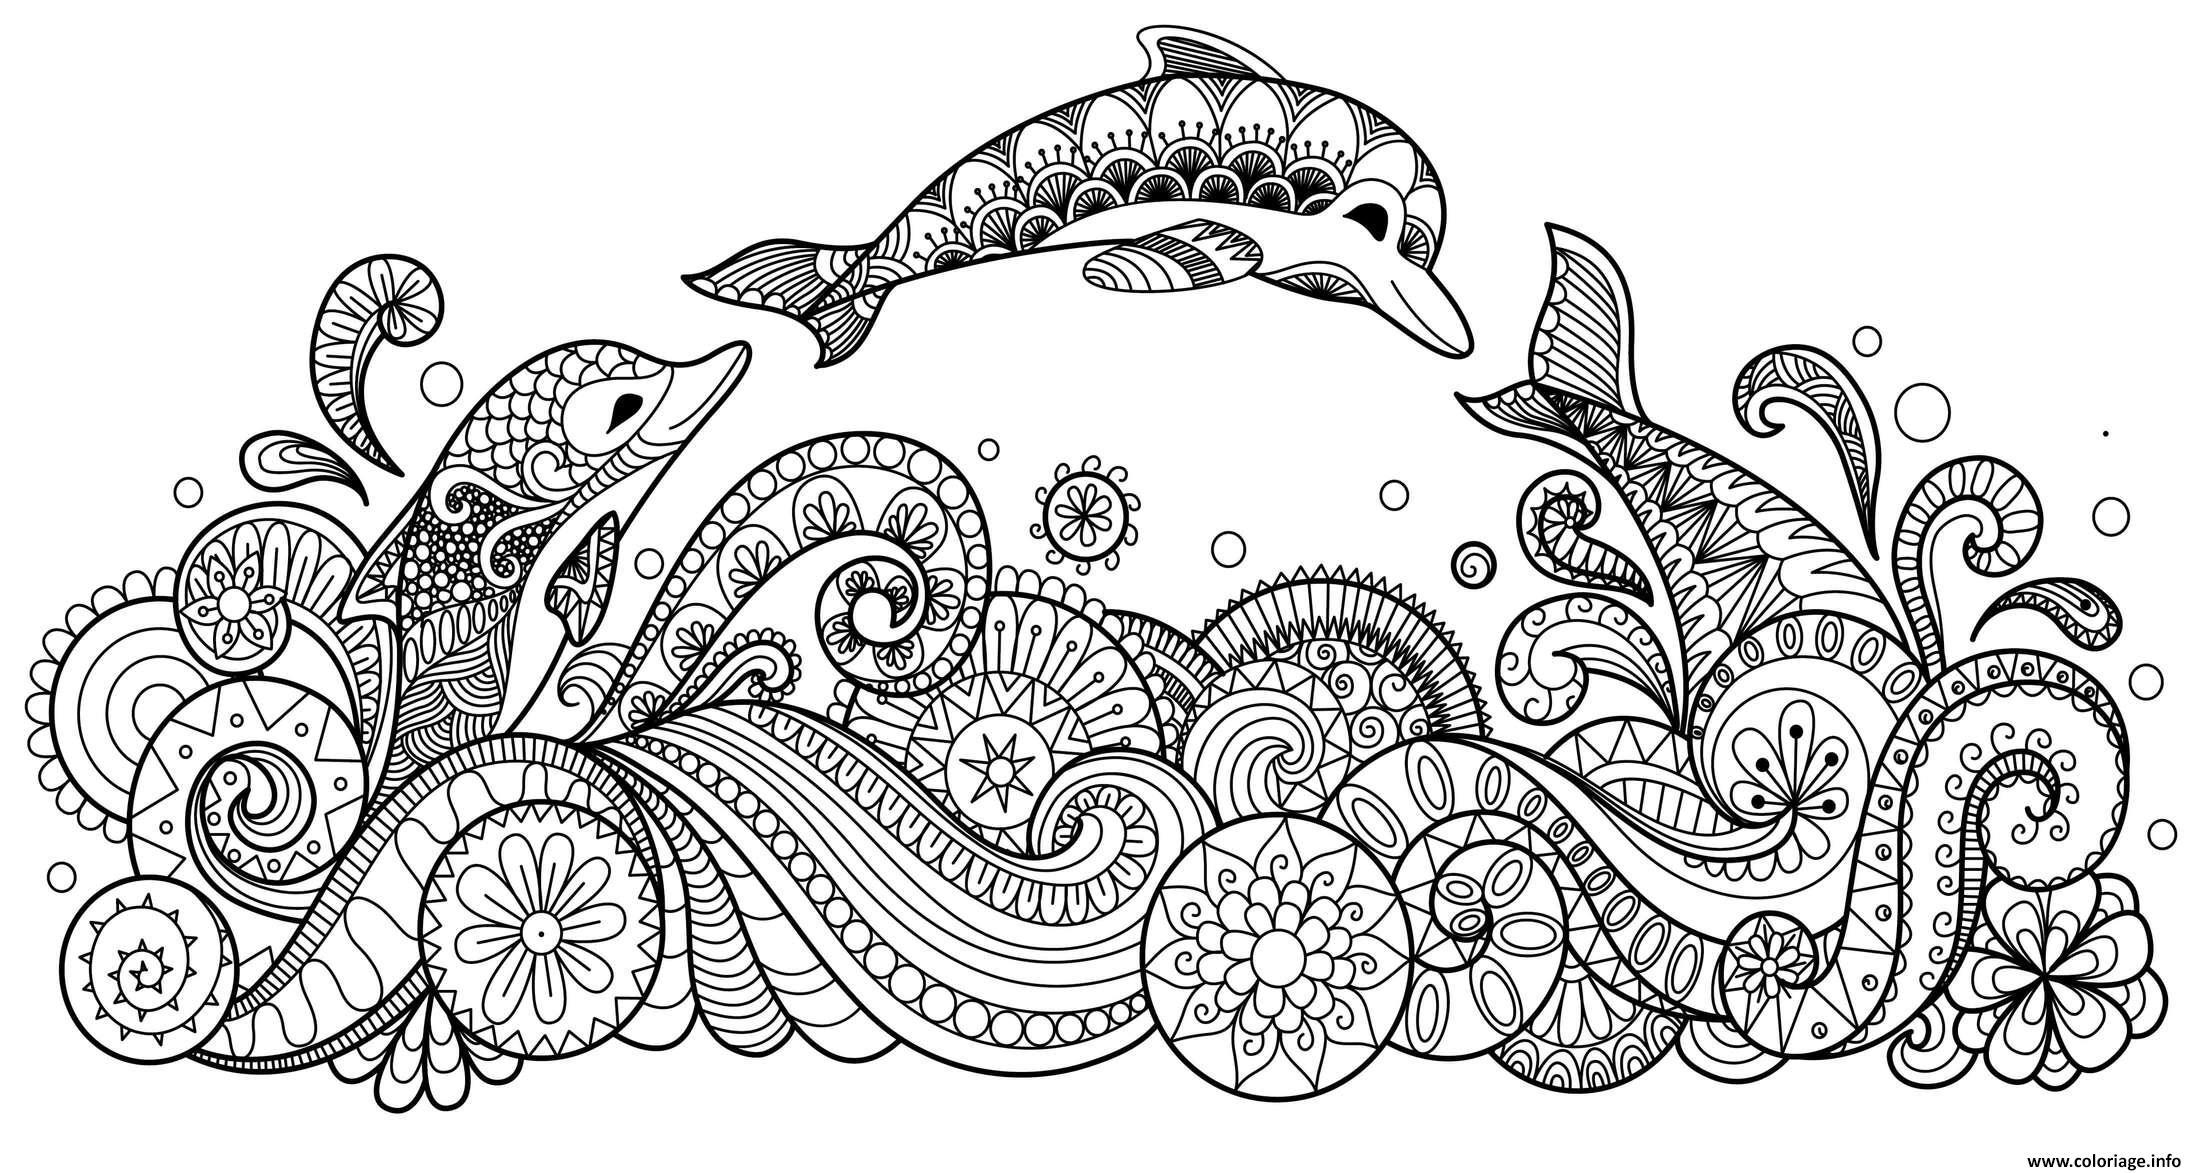 Coloriage dauphins mammiferes marins dans la mer animaux ...